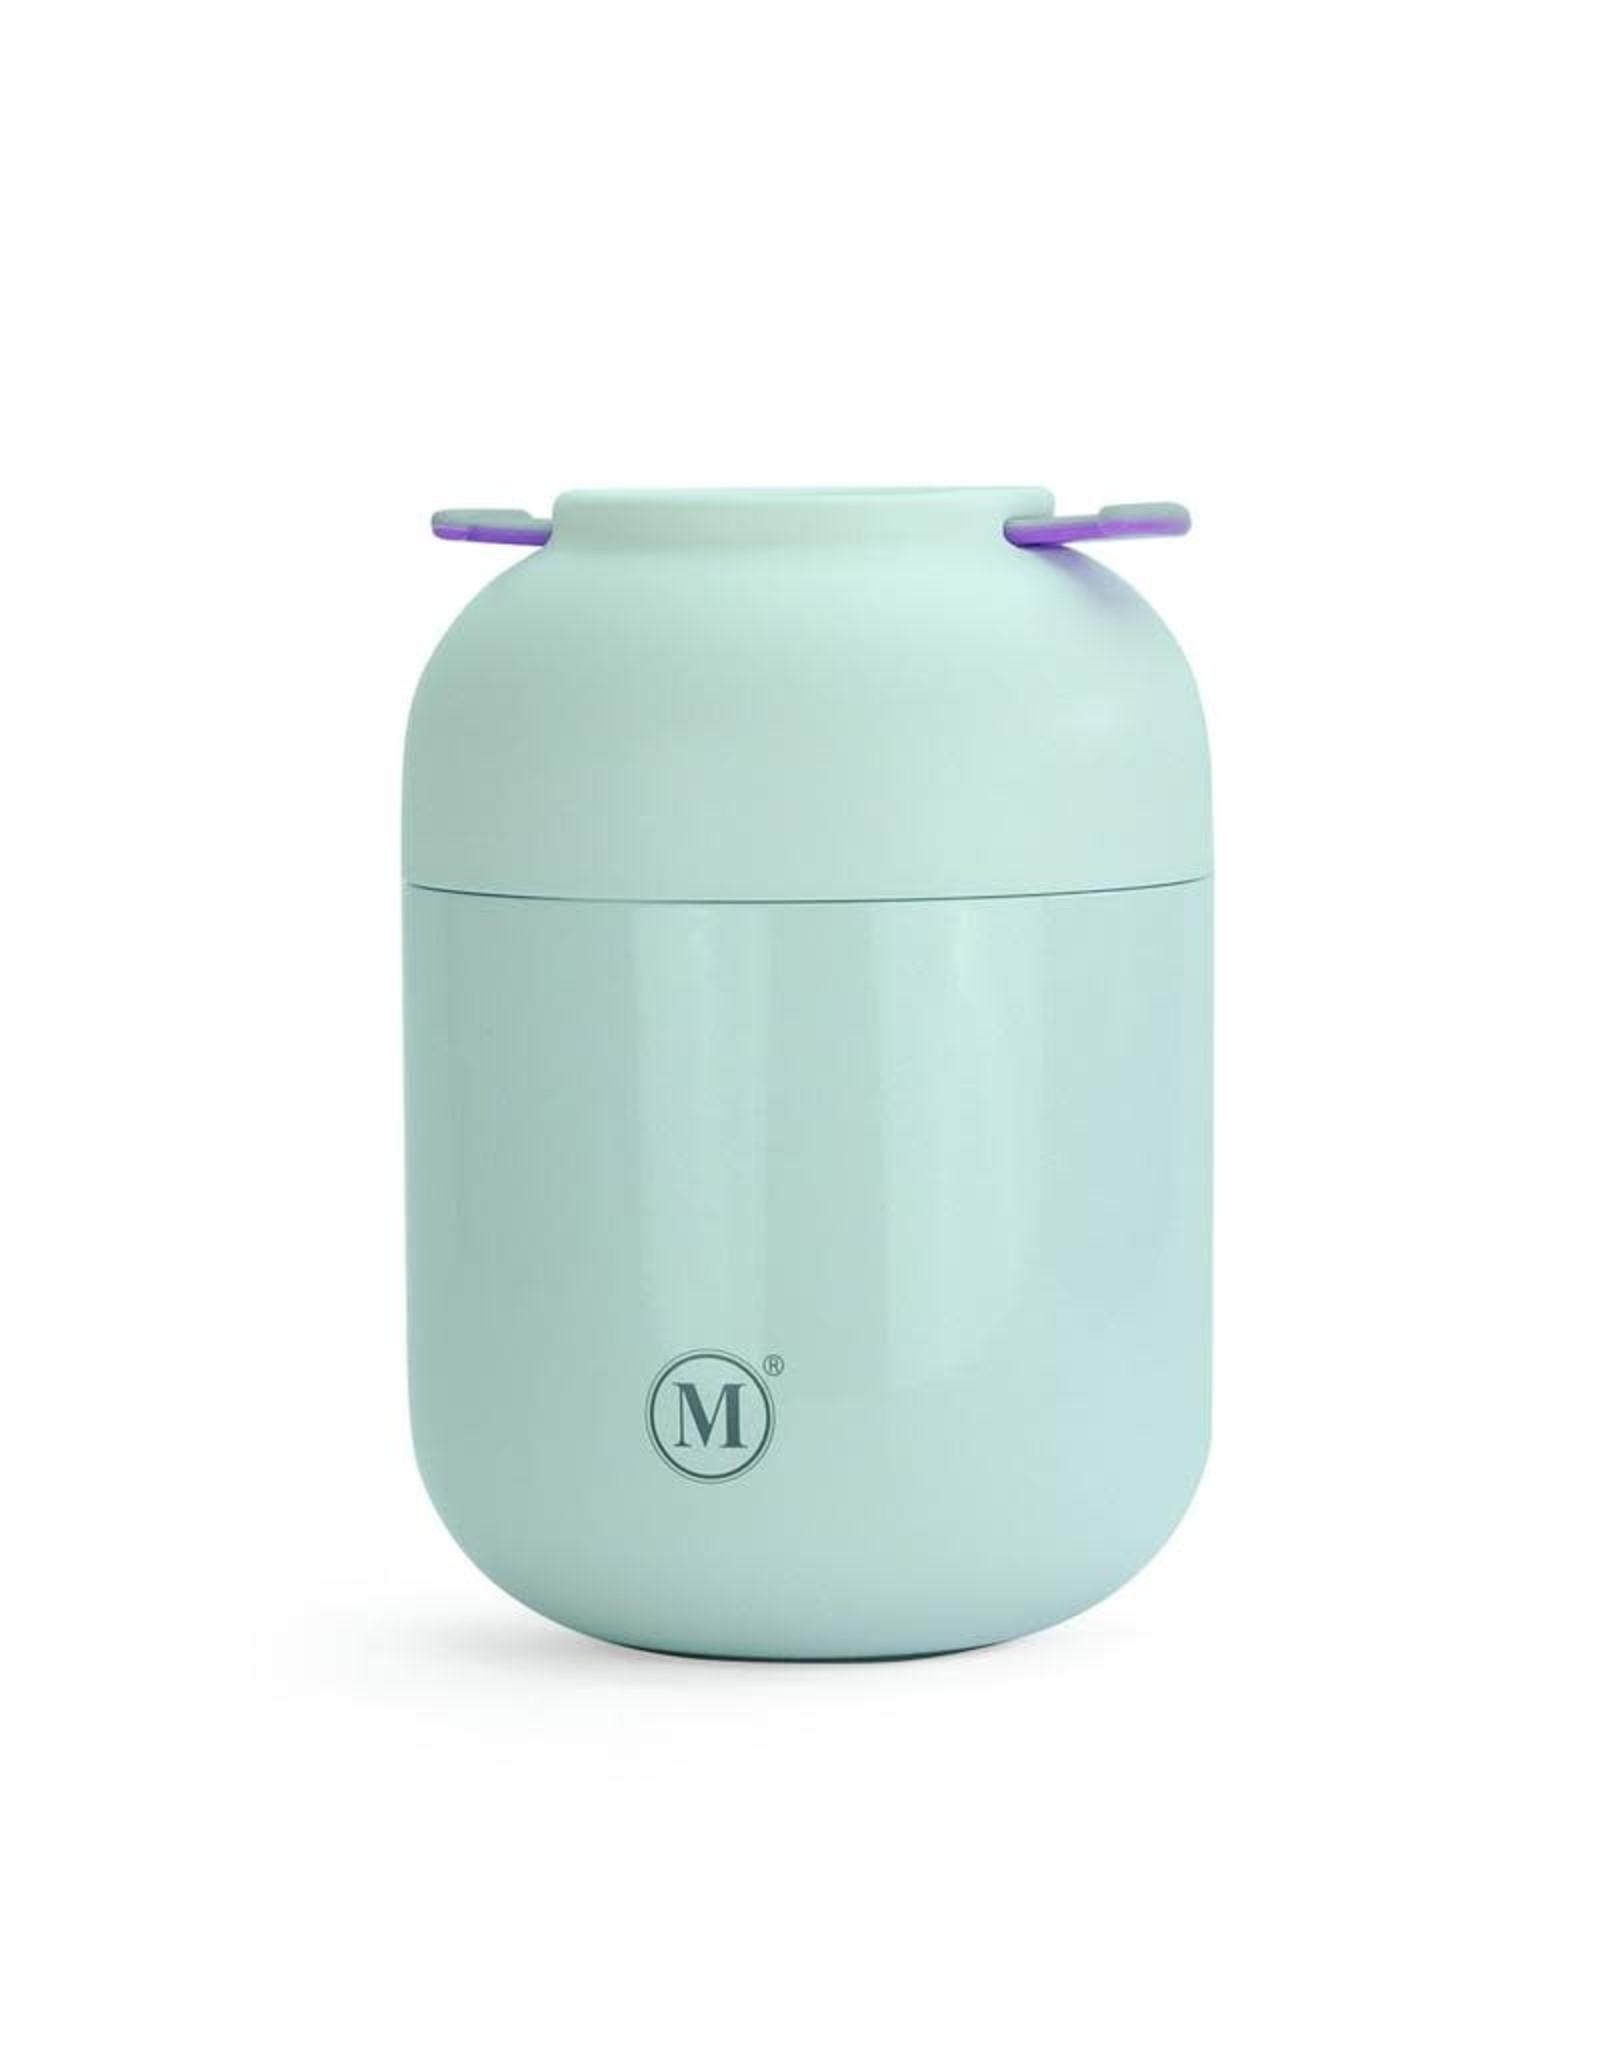 Minimal Nexten Minimal Insulated Food Jar V2 700mL - Limpet